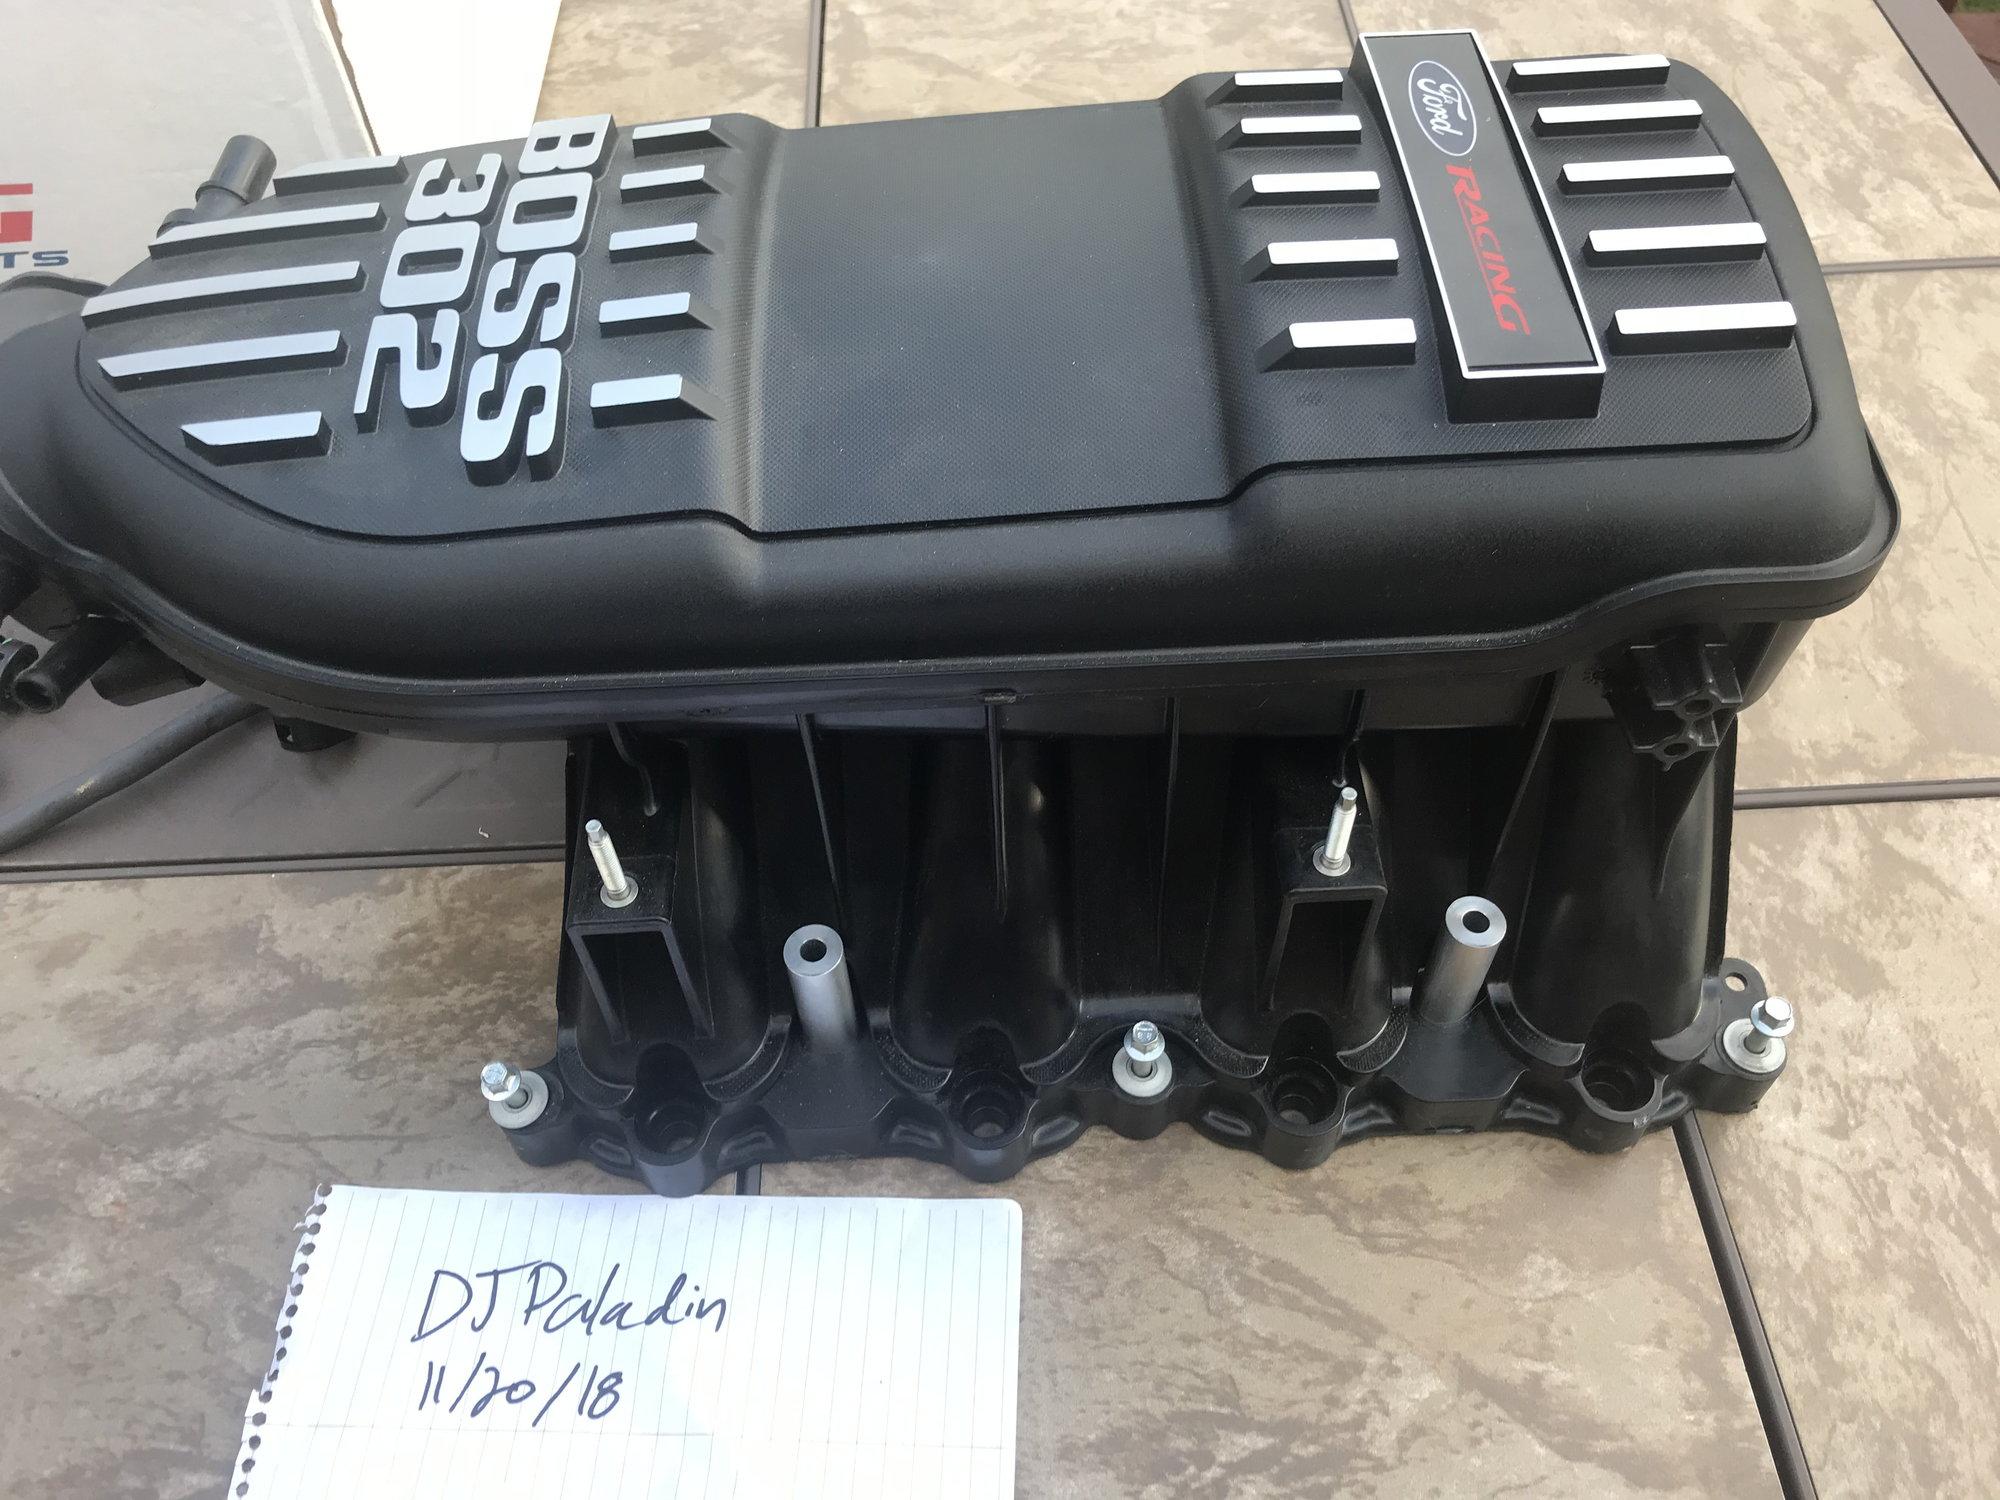 Boss 302 Intake Manifold >> Northeast Boss 302 Intake Manifold And Extras Ford F150 Forum